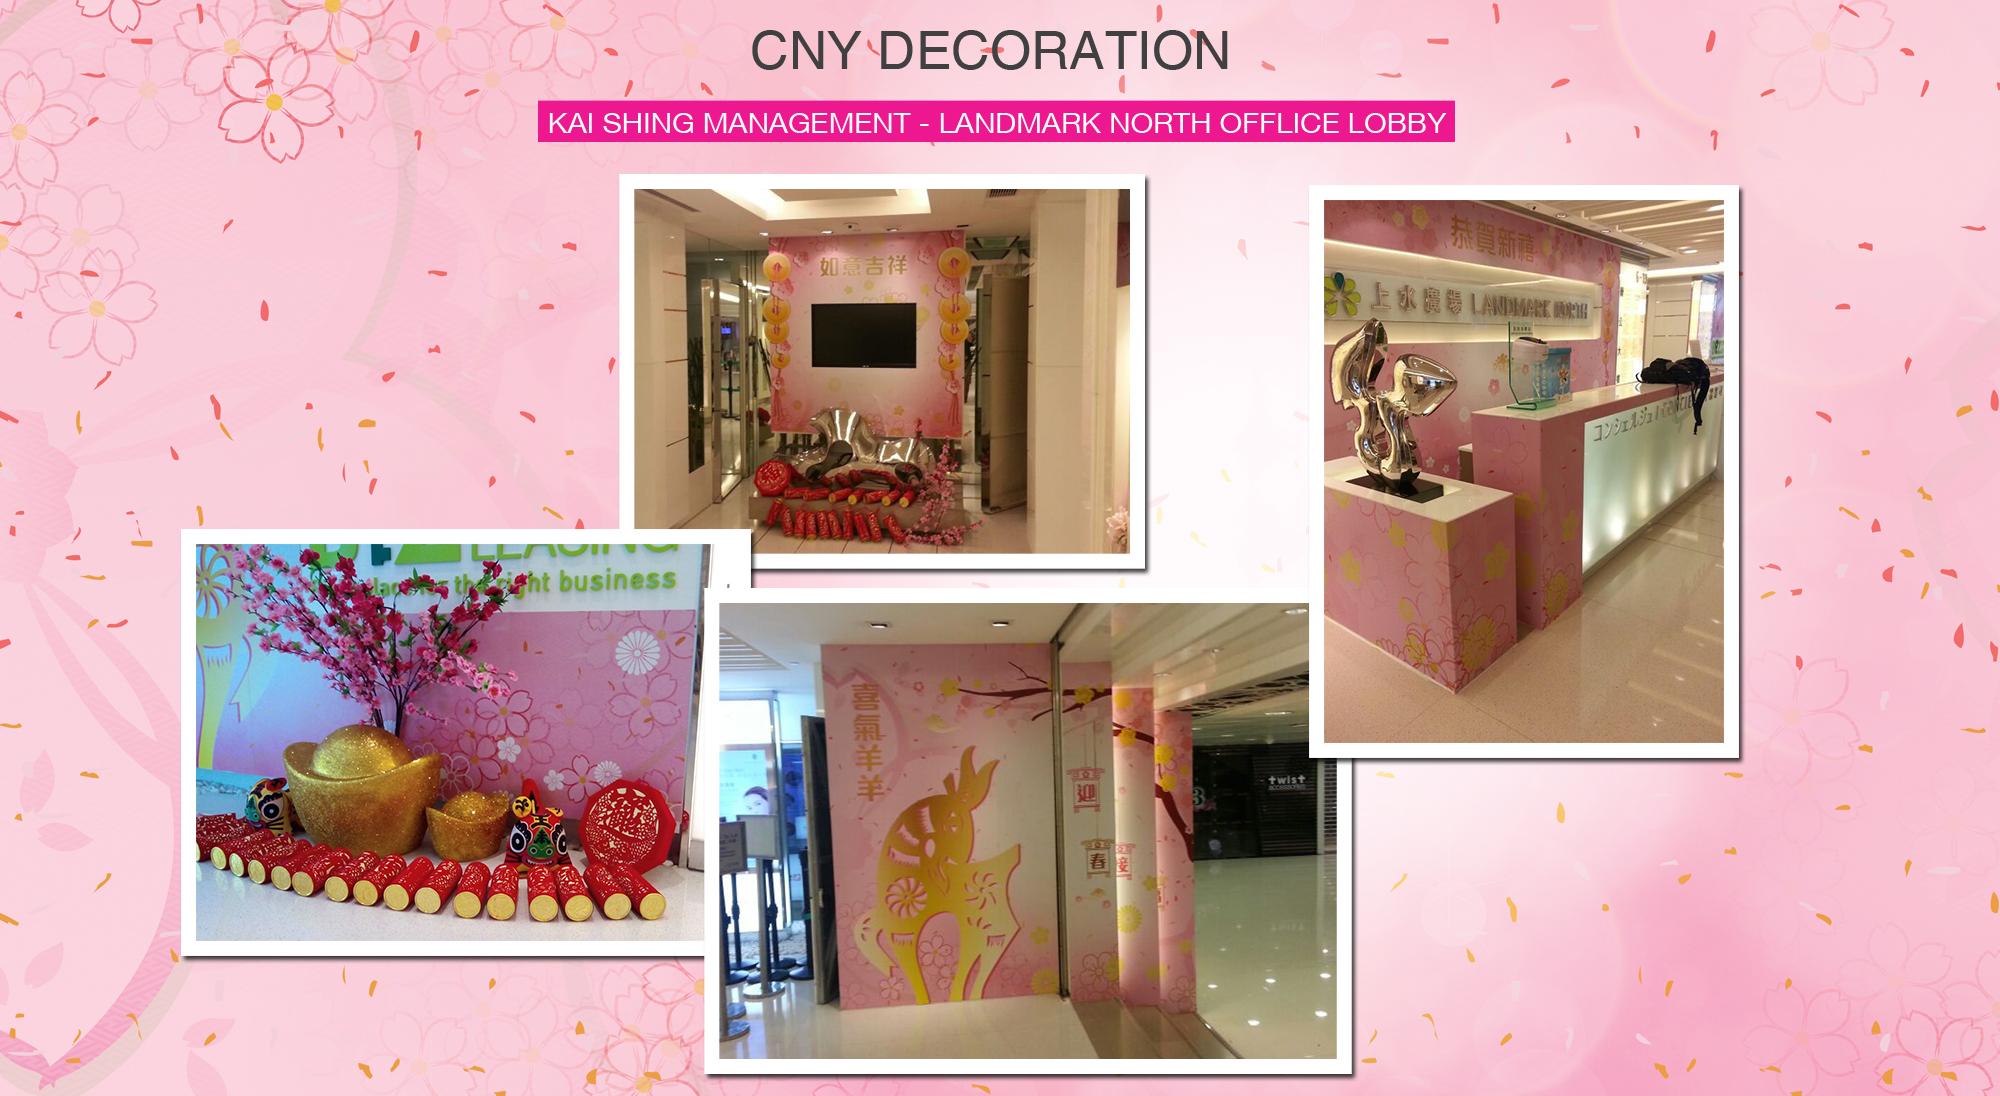 Landmark North Office - CNY Office Lobby Design